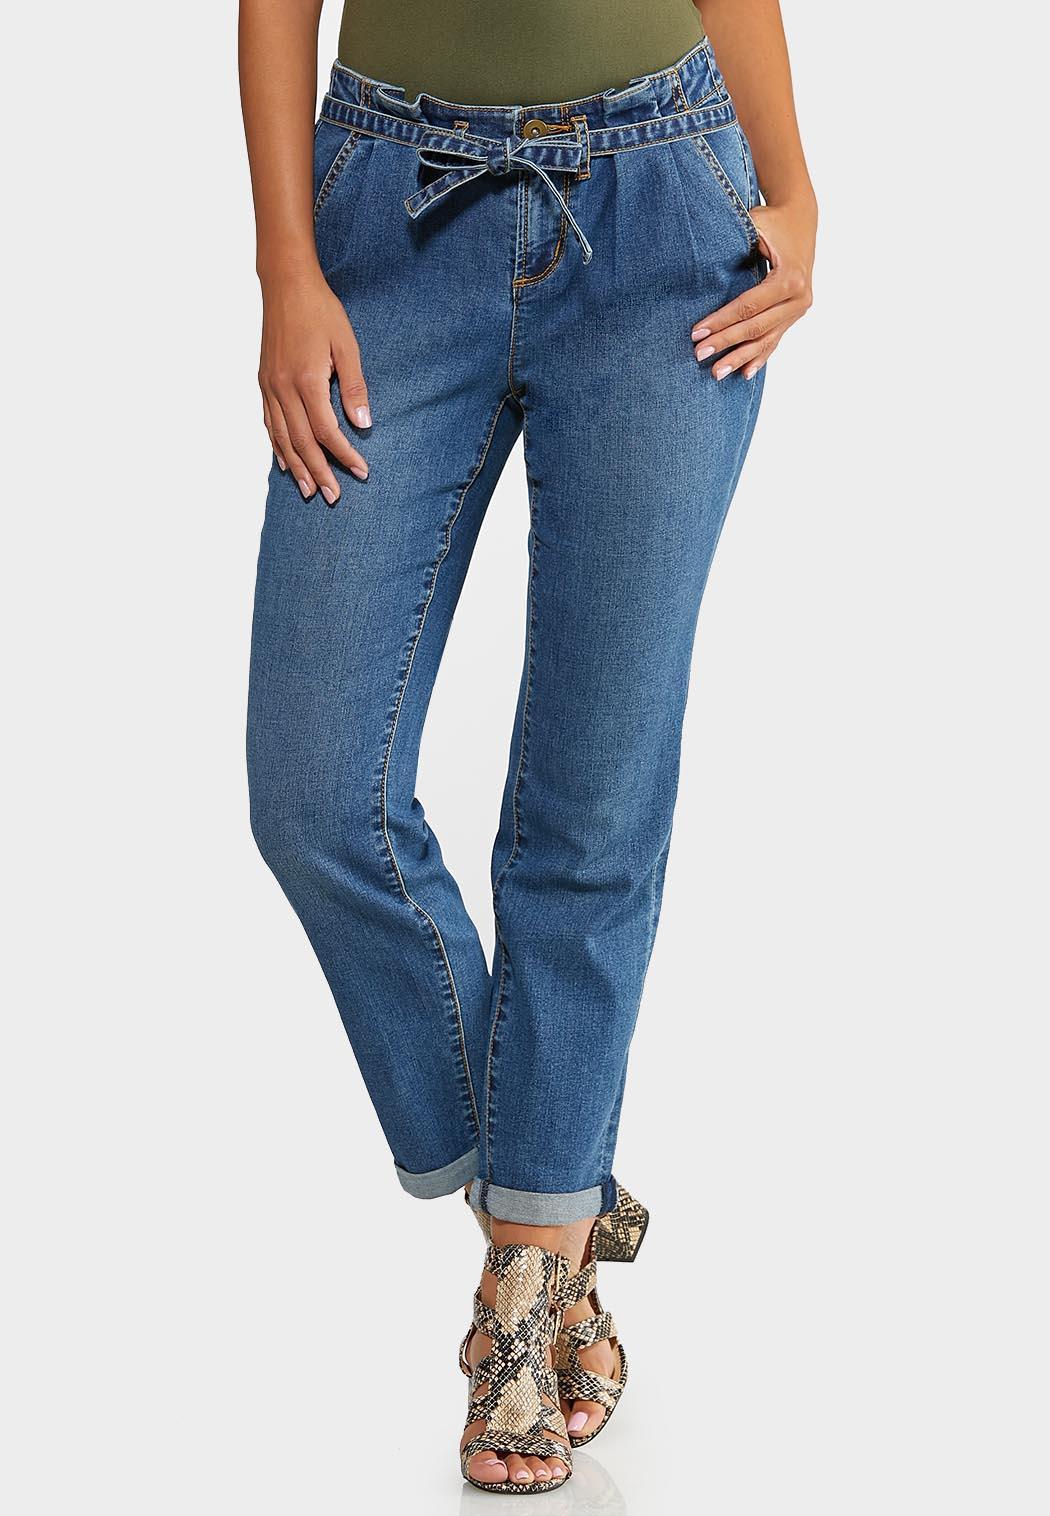 Paperbag Waist Girlfriend Jeans